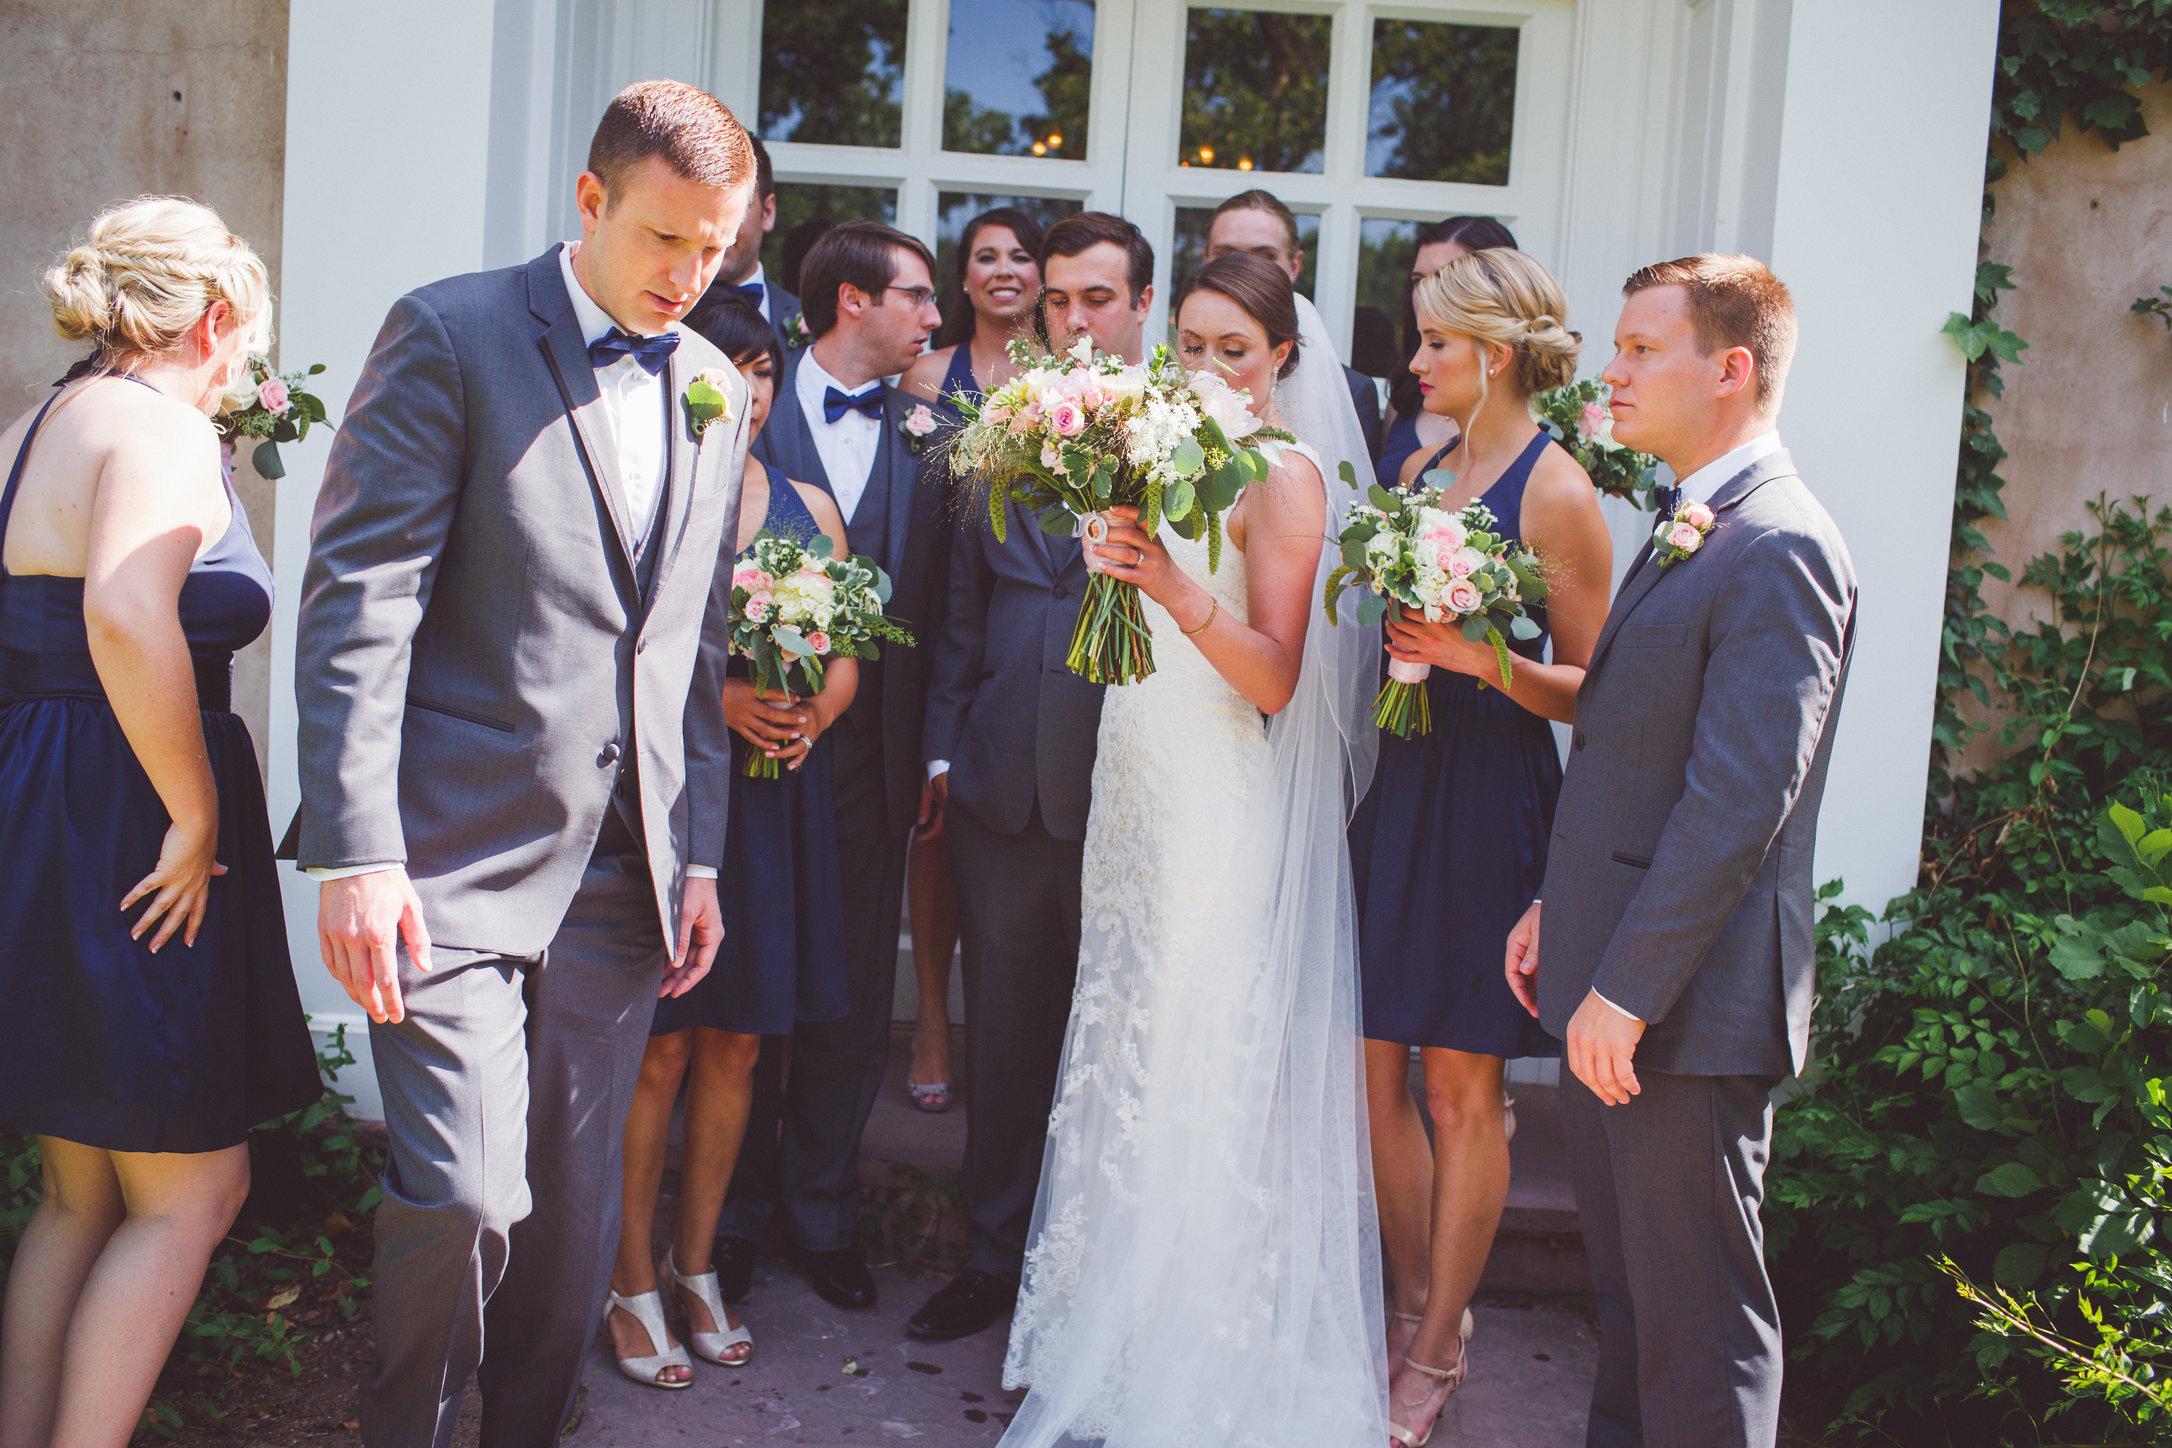 SandC-wedding-340.jpg